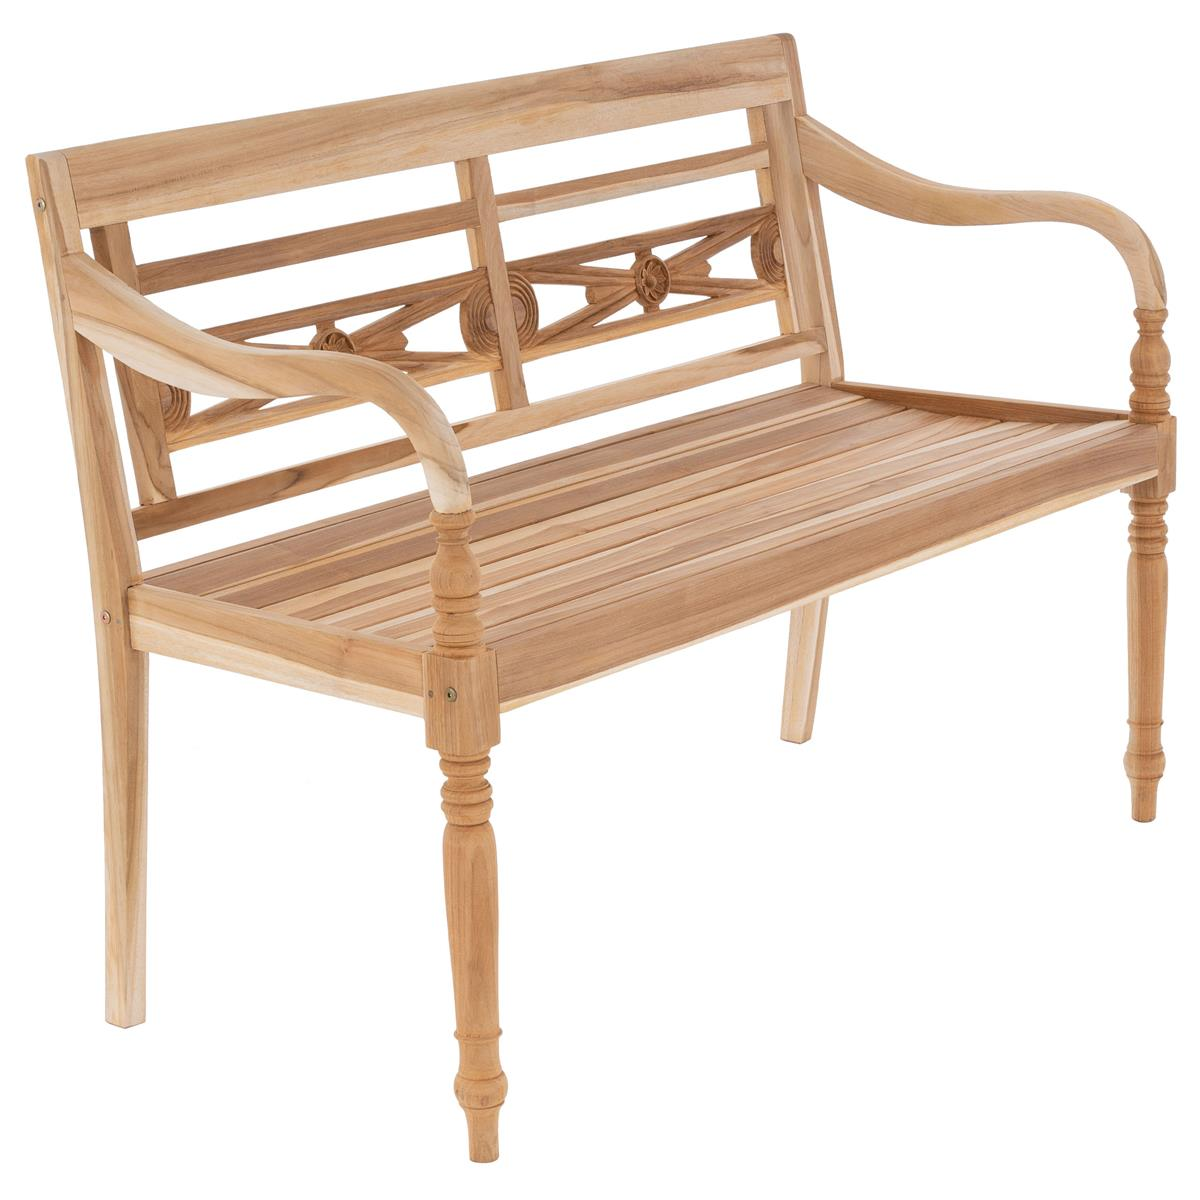 DIVERO 2-Sitzer Gartenbank Parkbank antik hochwertig Teak Holz natur 120 cm